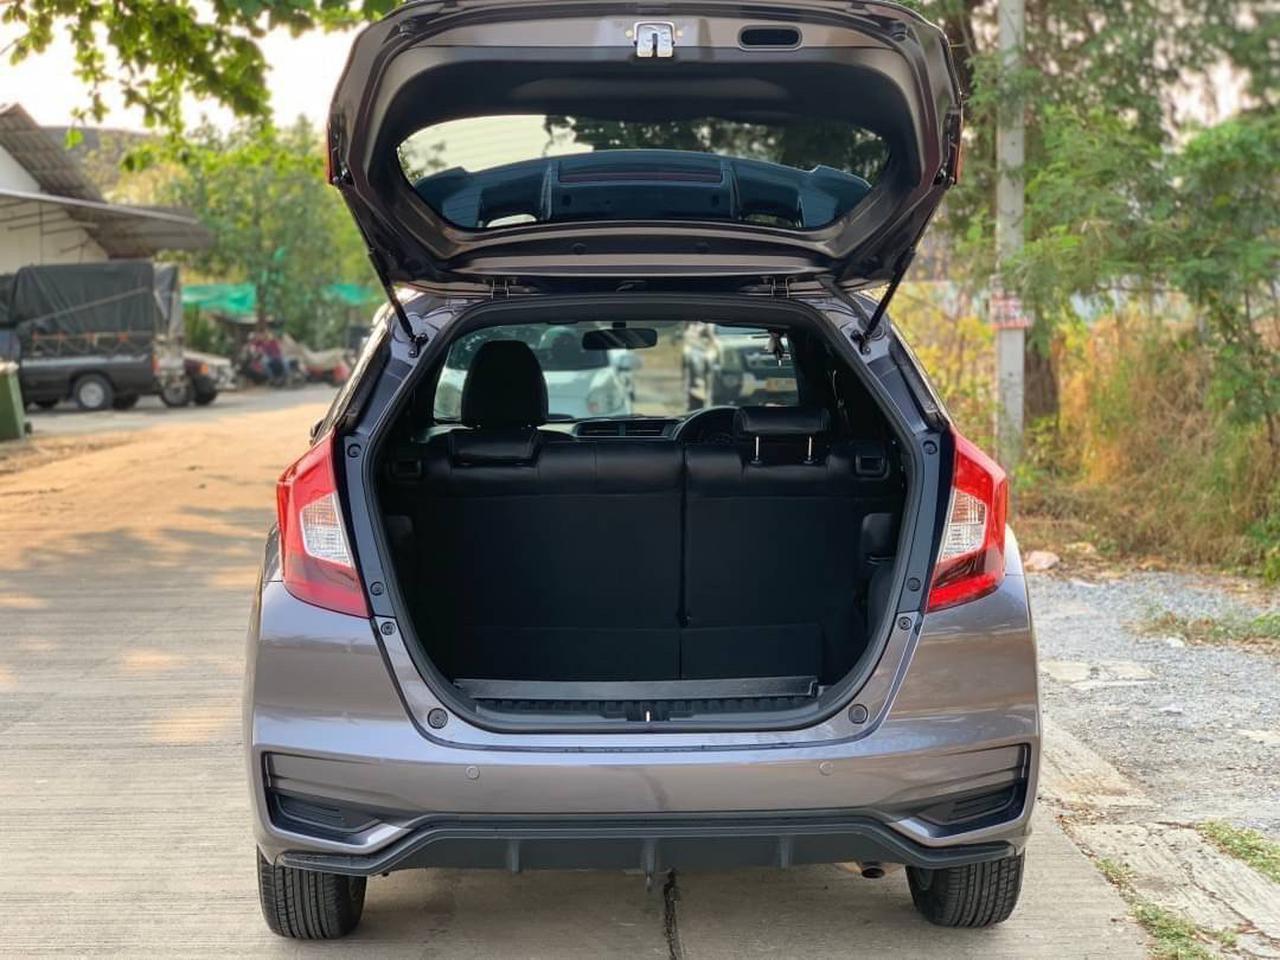 37 Honda New Jazz GK 1.5 RS (MNC) ปี 2019 สีขาว เกียร์ออโต้ รูปที่ 1